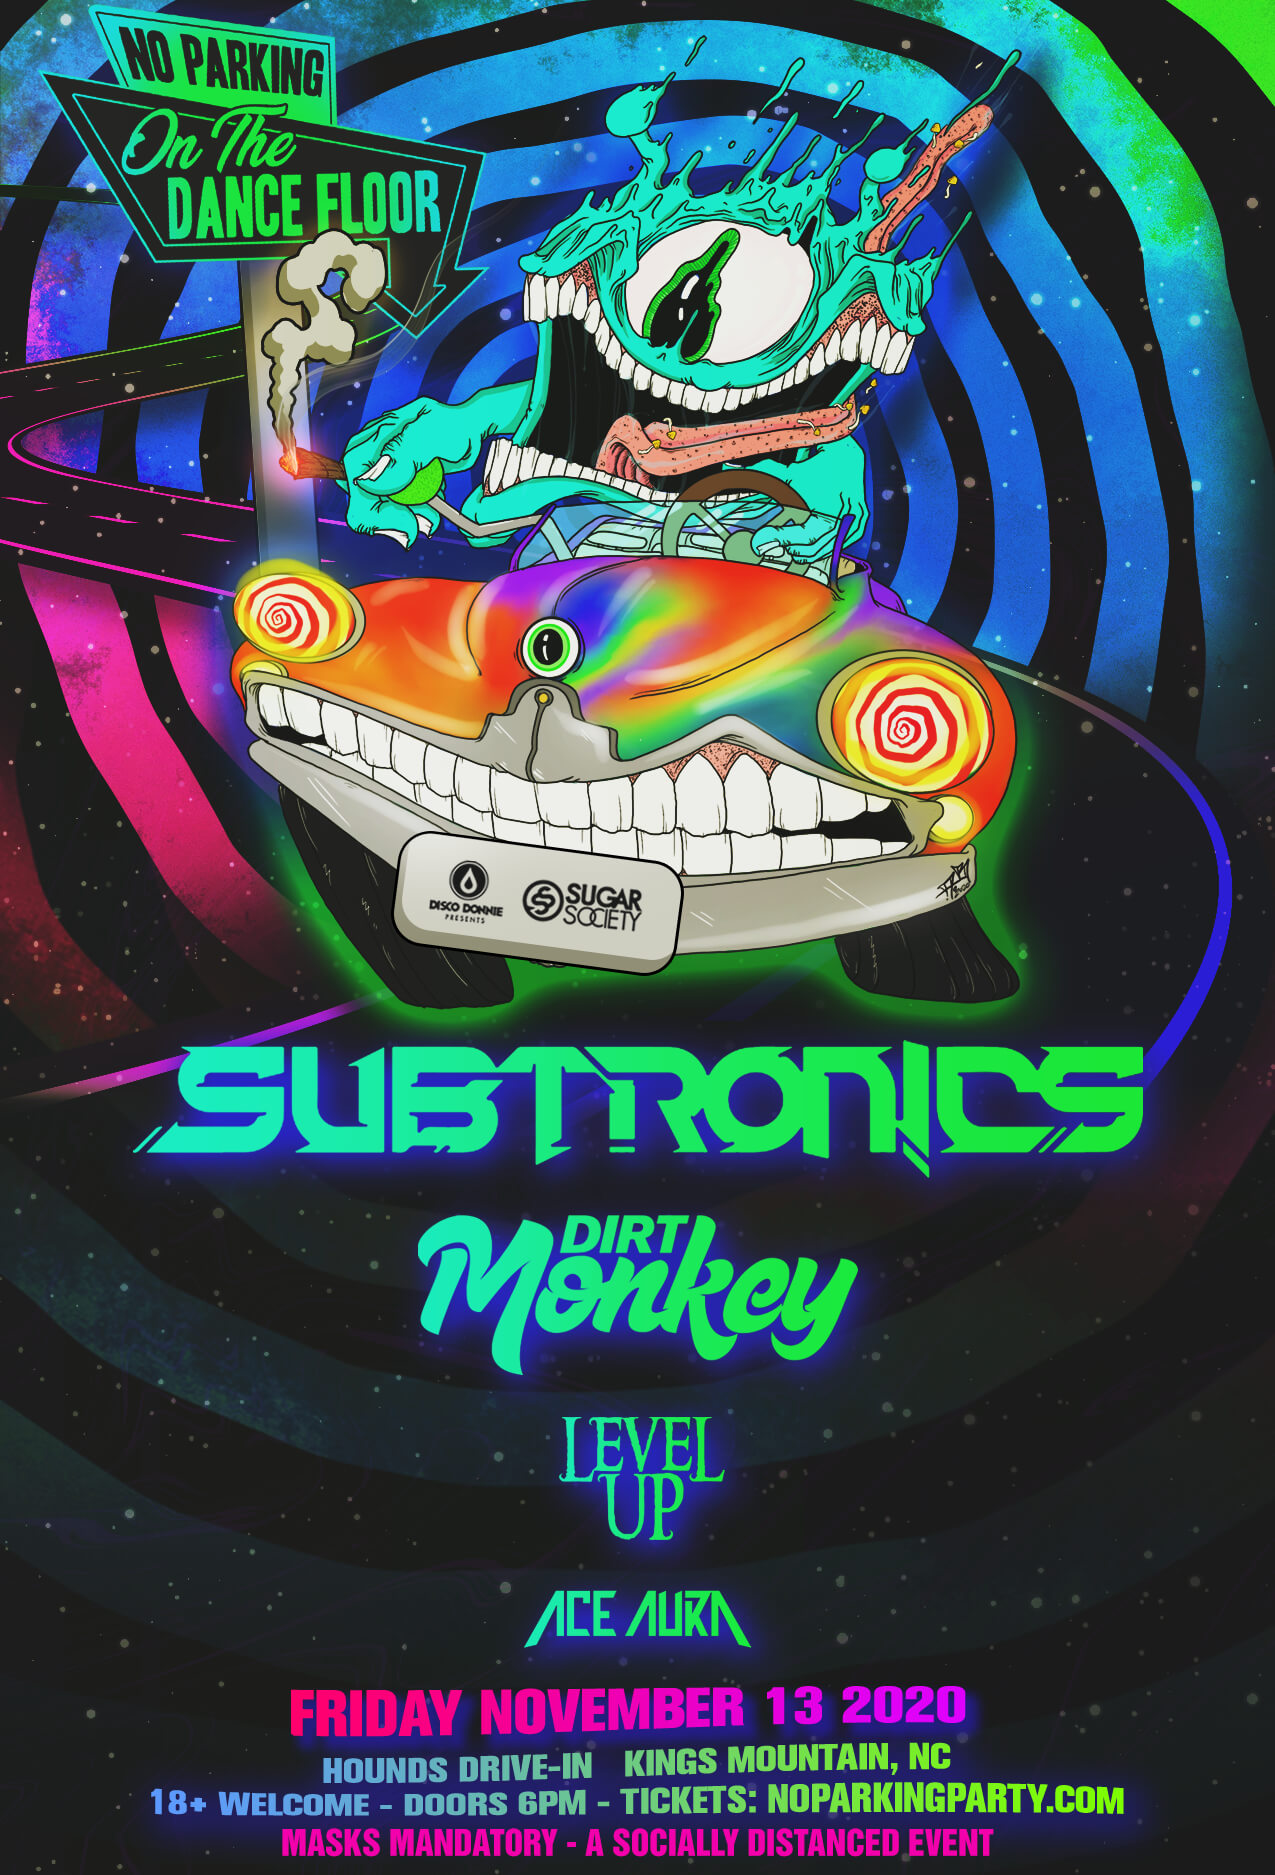 Subtronics, Dirt Monkey, Level Up, Ace Aura in Kings Mountain